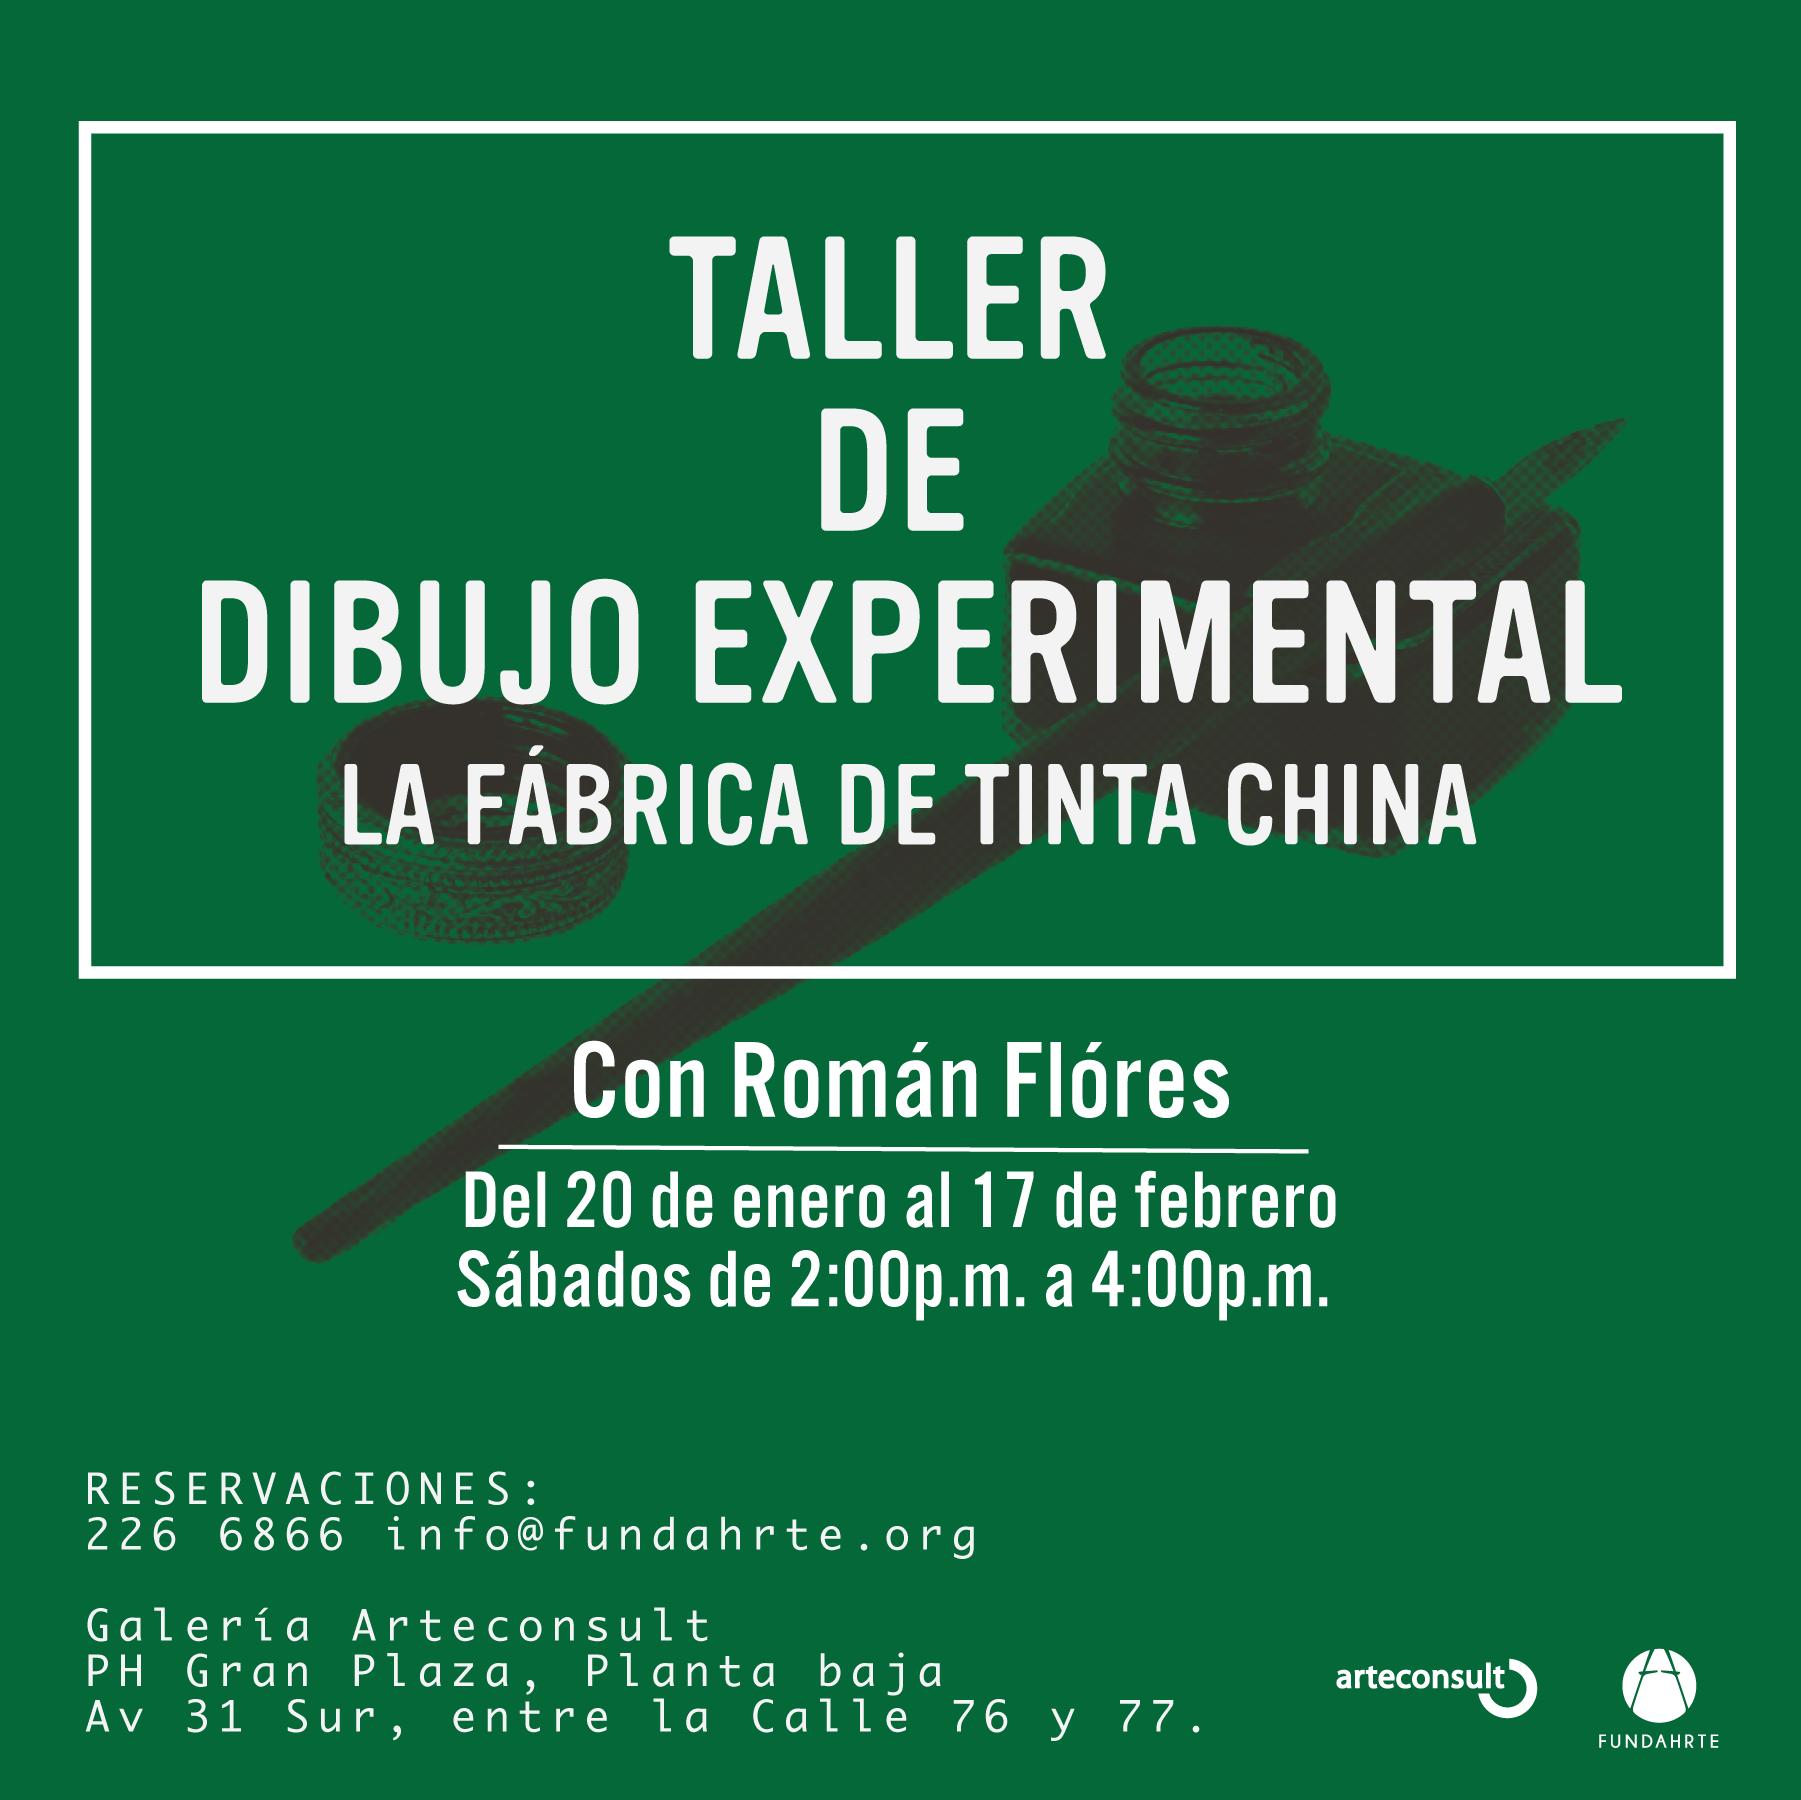 TallerDibujoExperimentalTintaChina.png